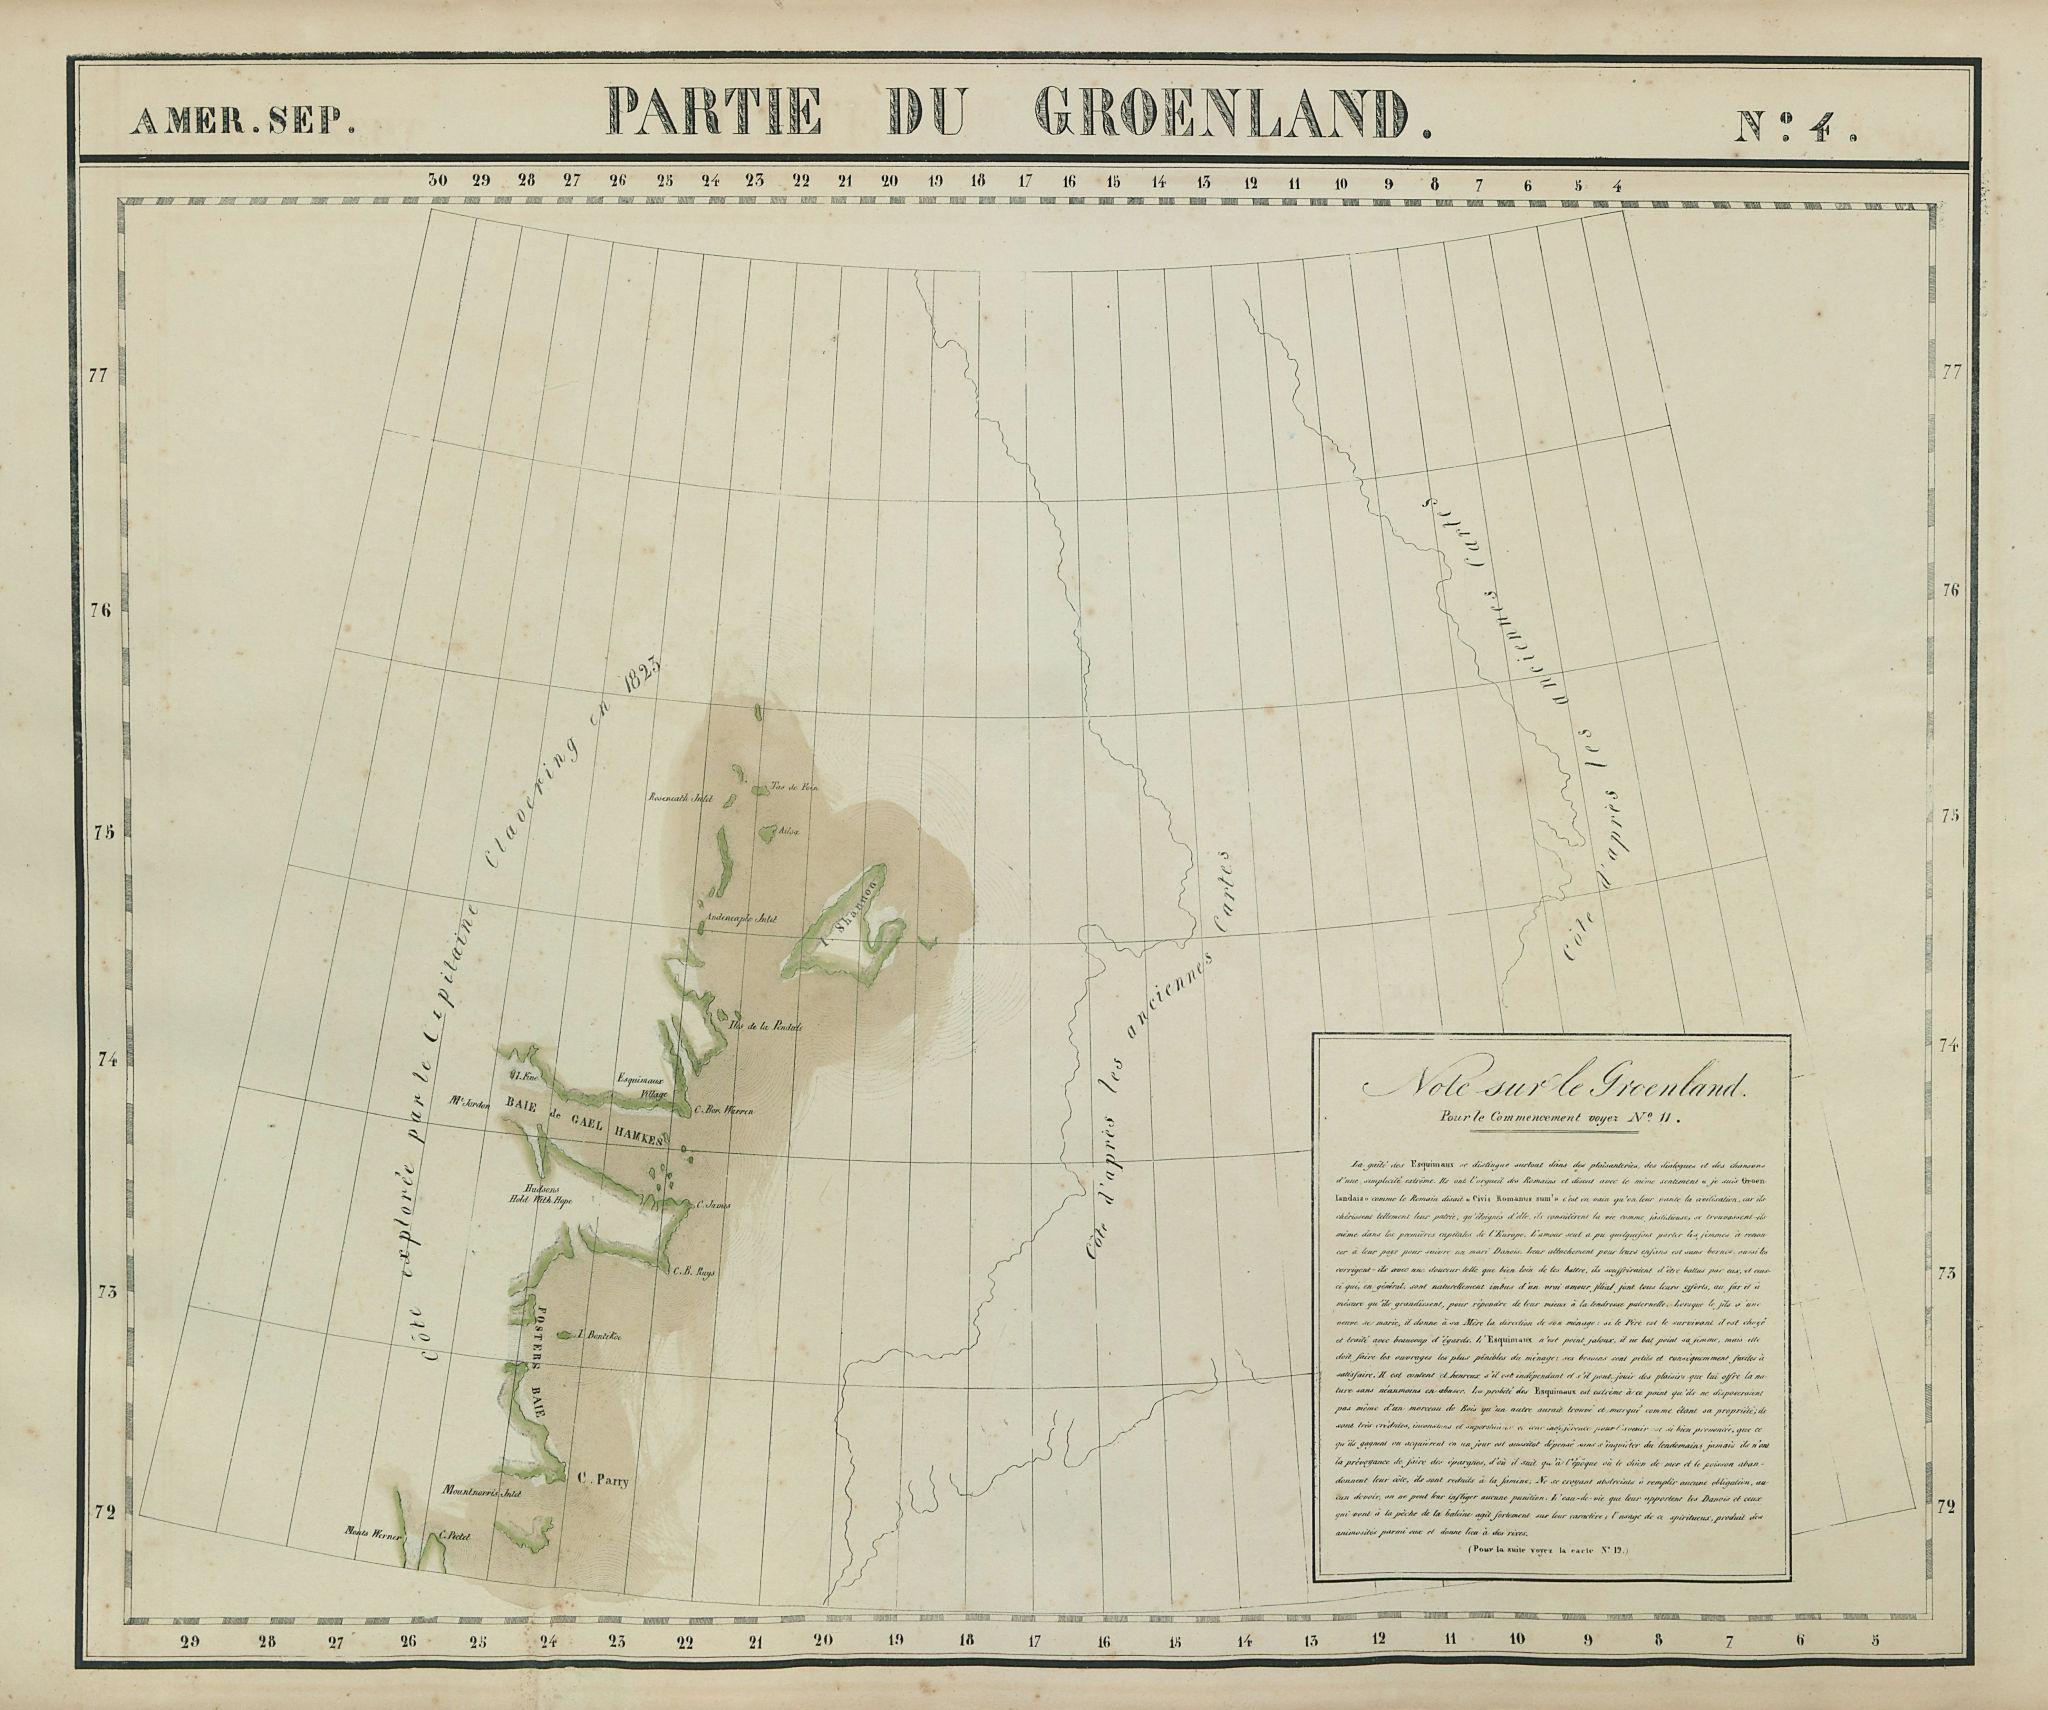 Amér. Sep. Partie du Groenland #4. North east Greenland. VANDERMAELEN 1827 map